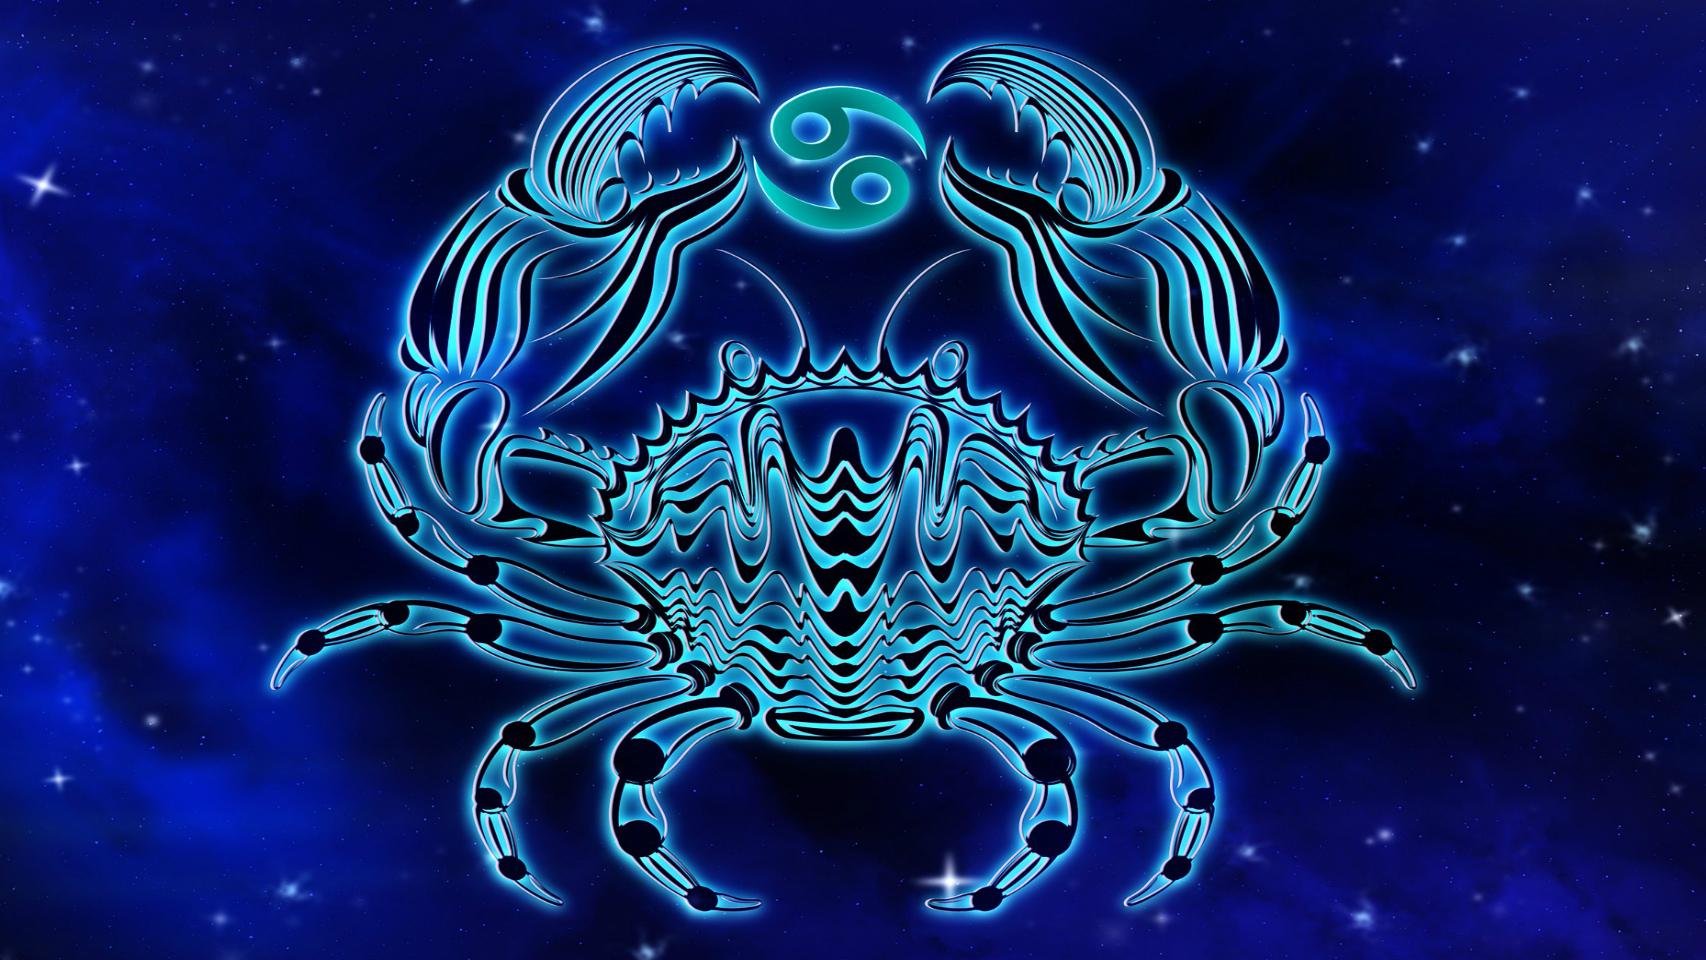 https://s1.eestatic.com/2019/12/31/sociedad/horoscopo/horoscopo-astrologia-ano_nuevo_456214838_141468213_1706x960.jpg